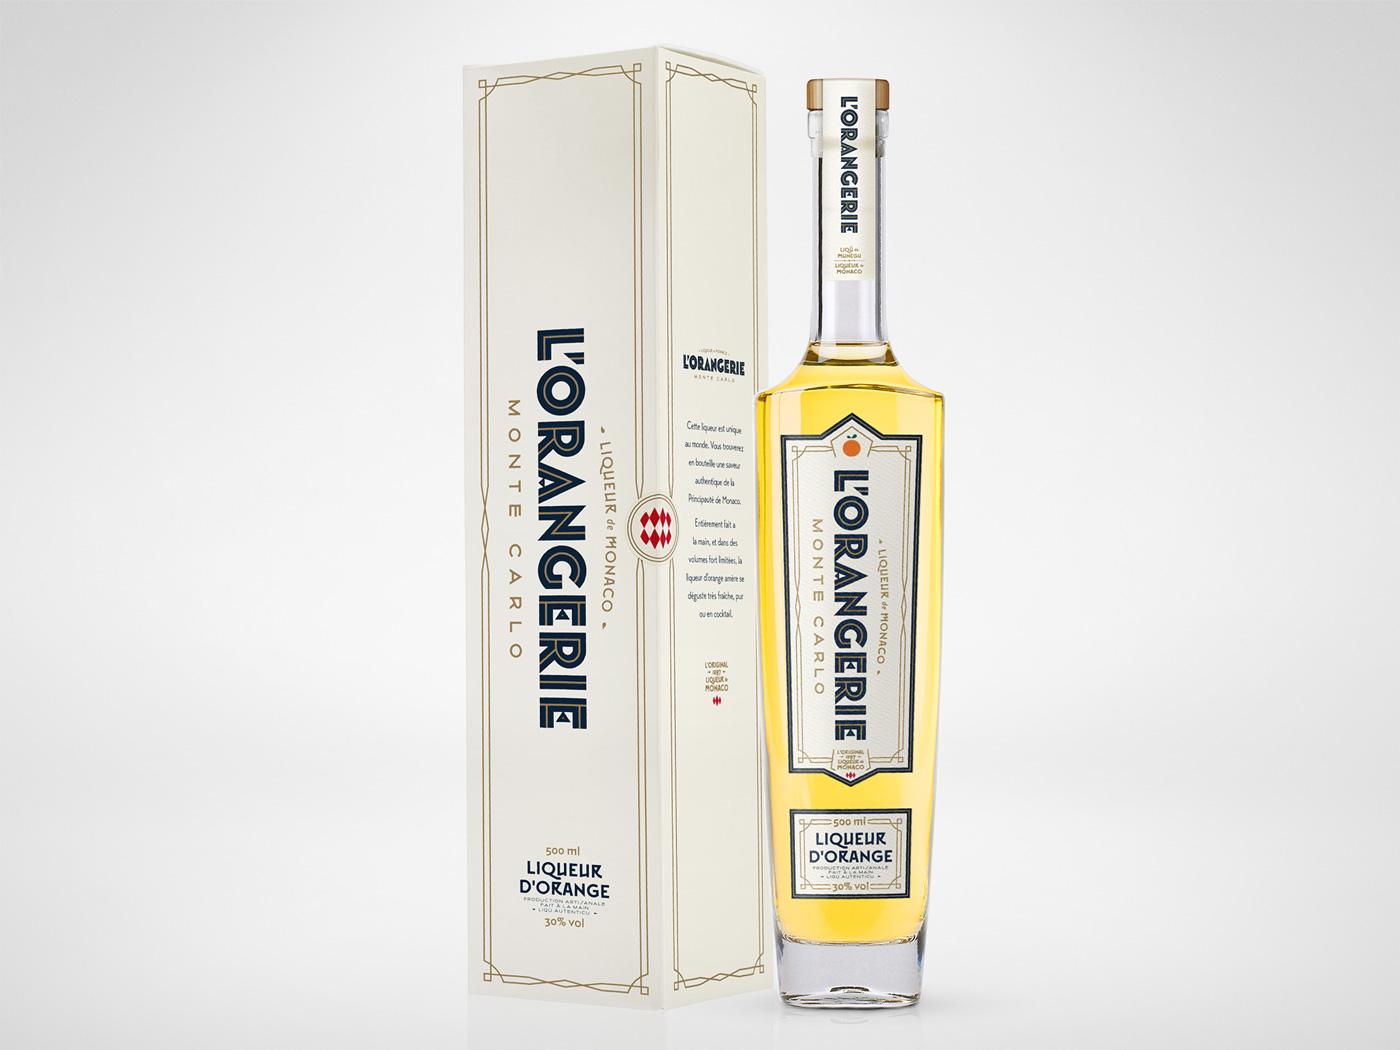 L'Orangerie Monte Carlo Orange Liqueur Bottle and Box